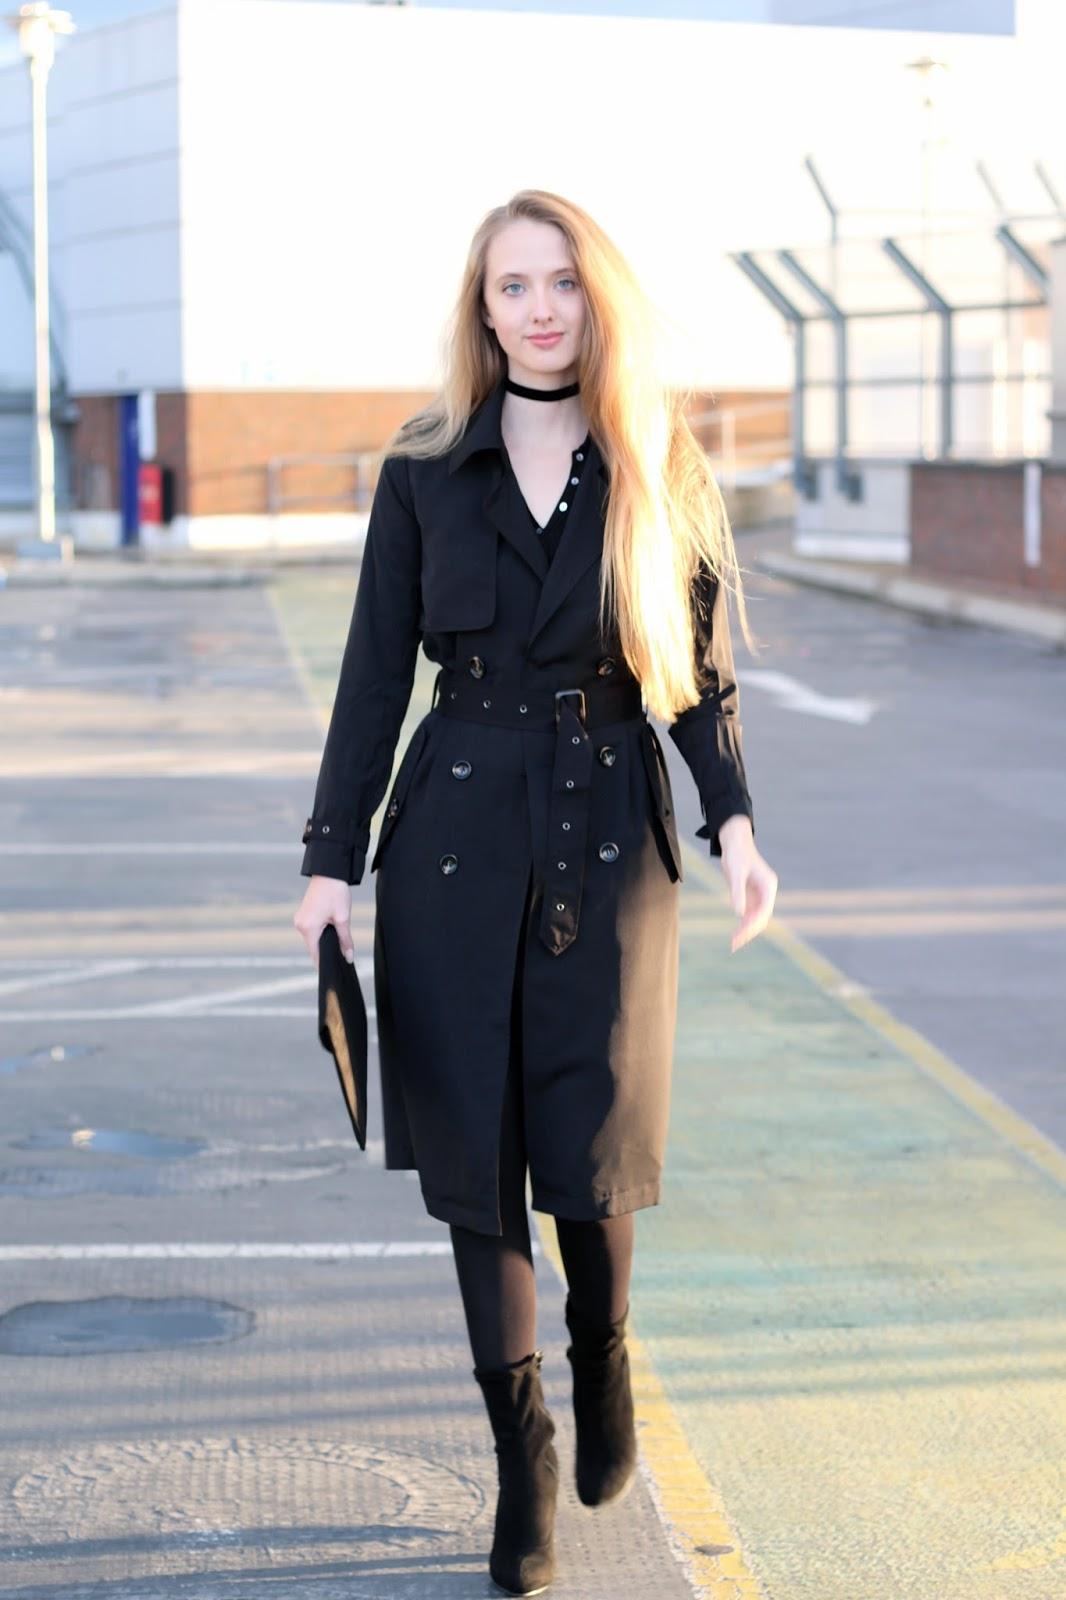 Boohoo fashion blogger collaboration UK 2016